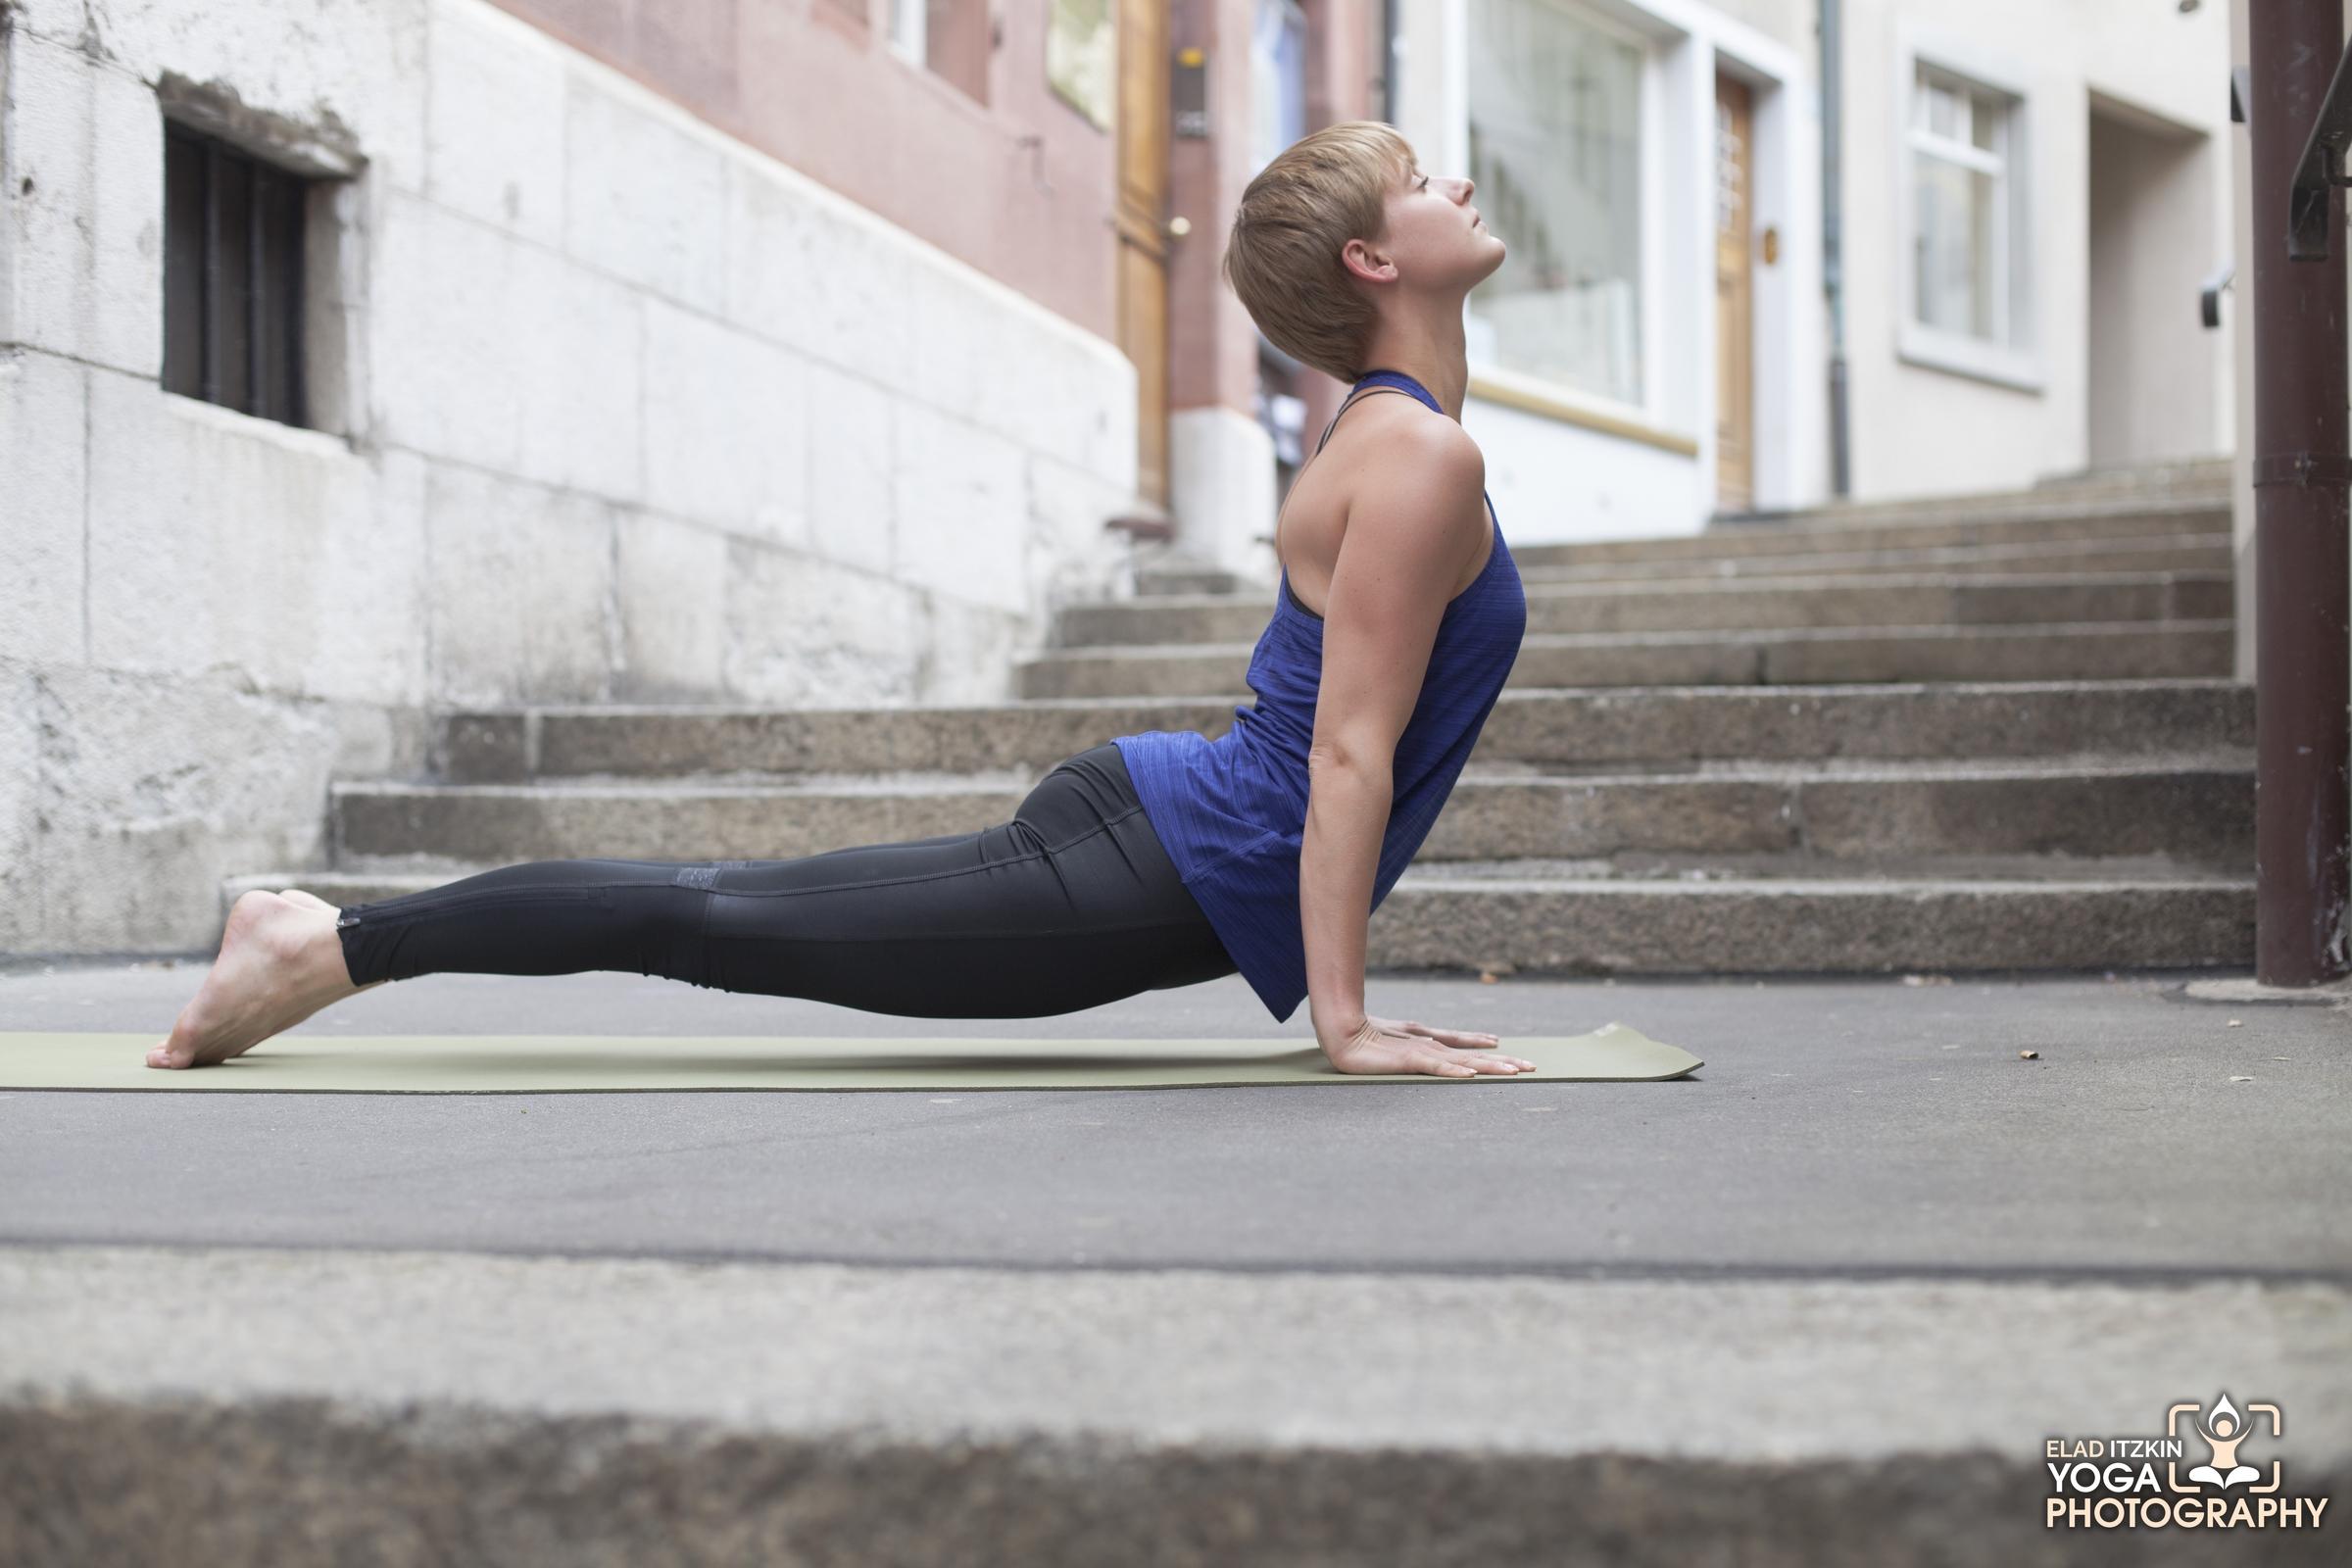 Livia Yoga Photos in Basel, Switzerland, Elad Itzkin Yoga Photography